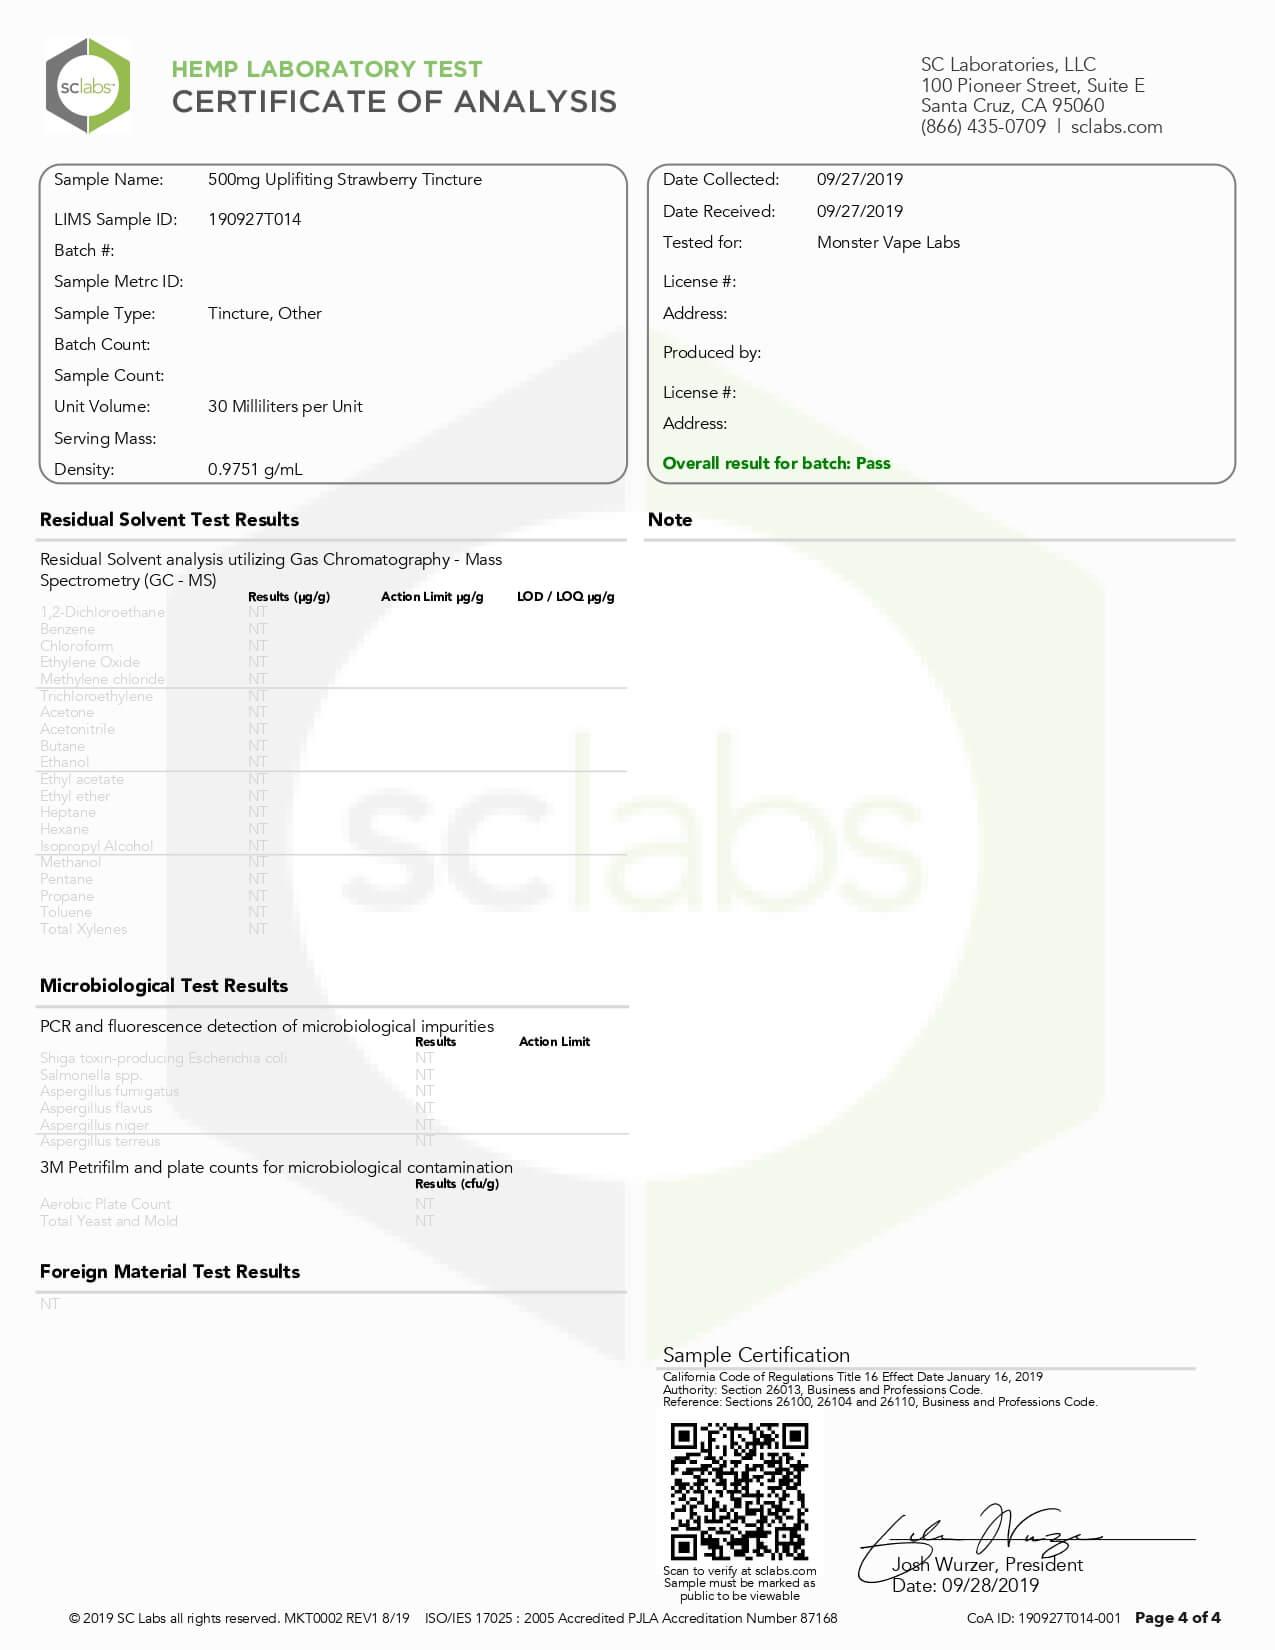 Hempcy CBD Tincture Uplifting Strawberry 500mg Lab Report